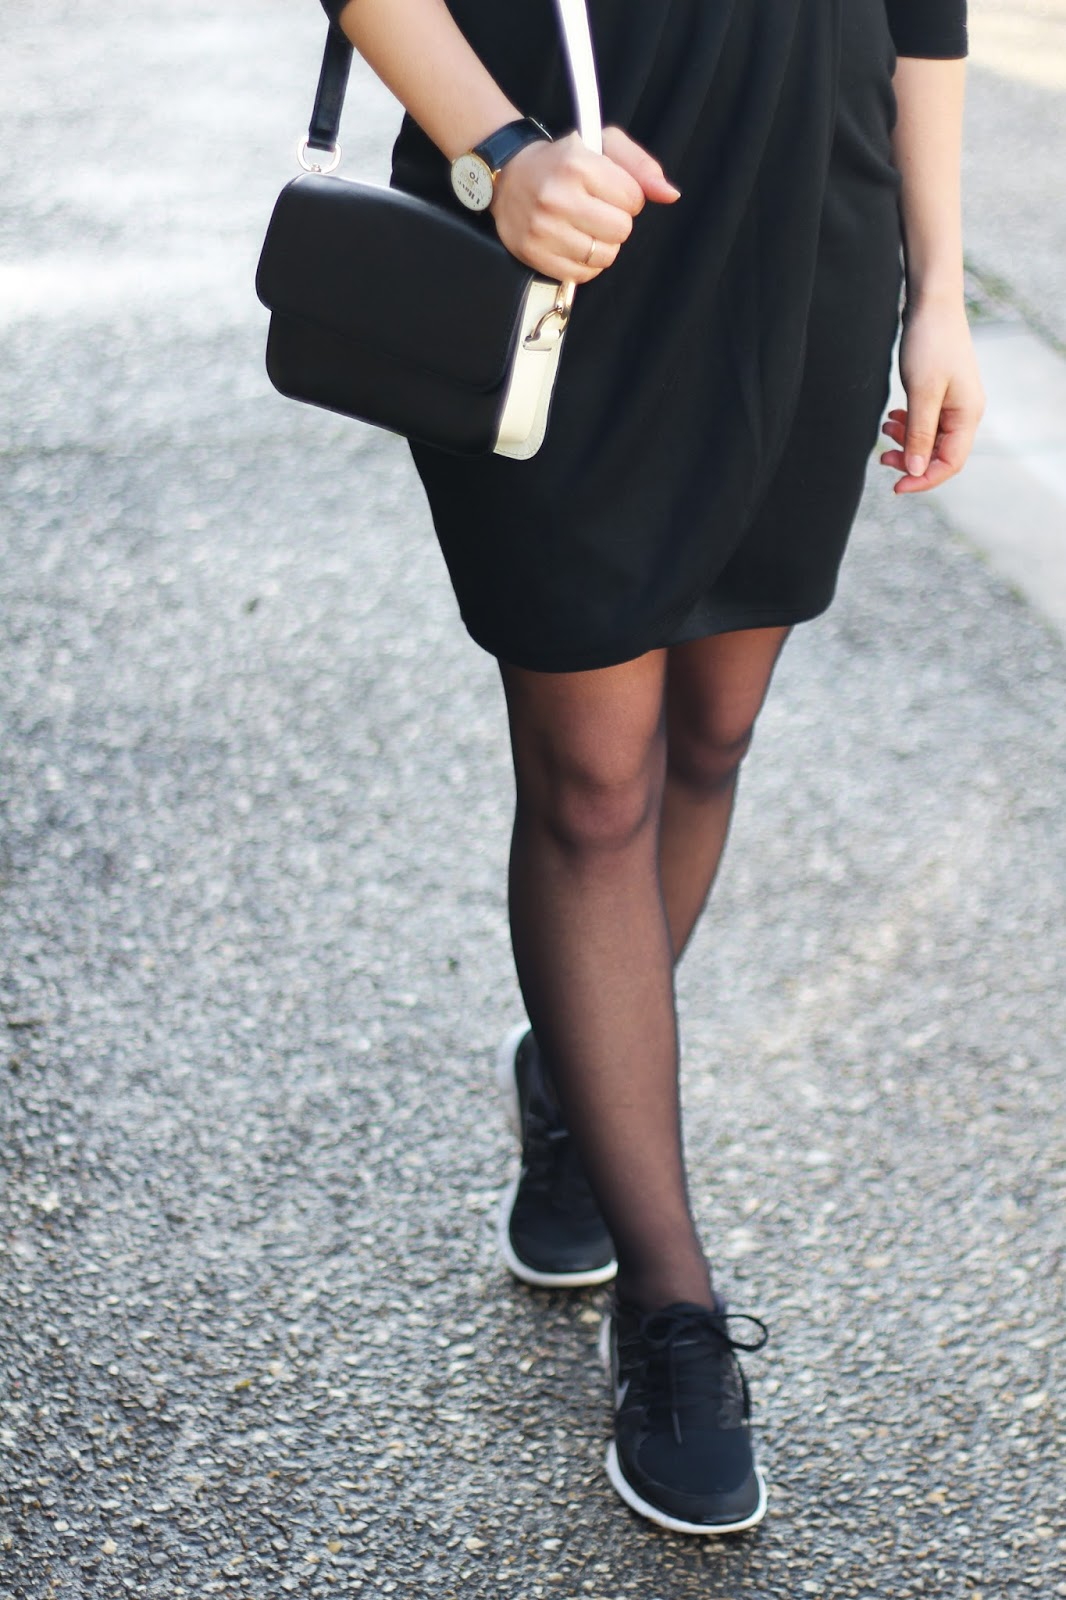 sac pochette bicolore noir blanc